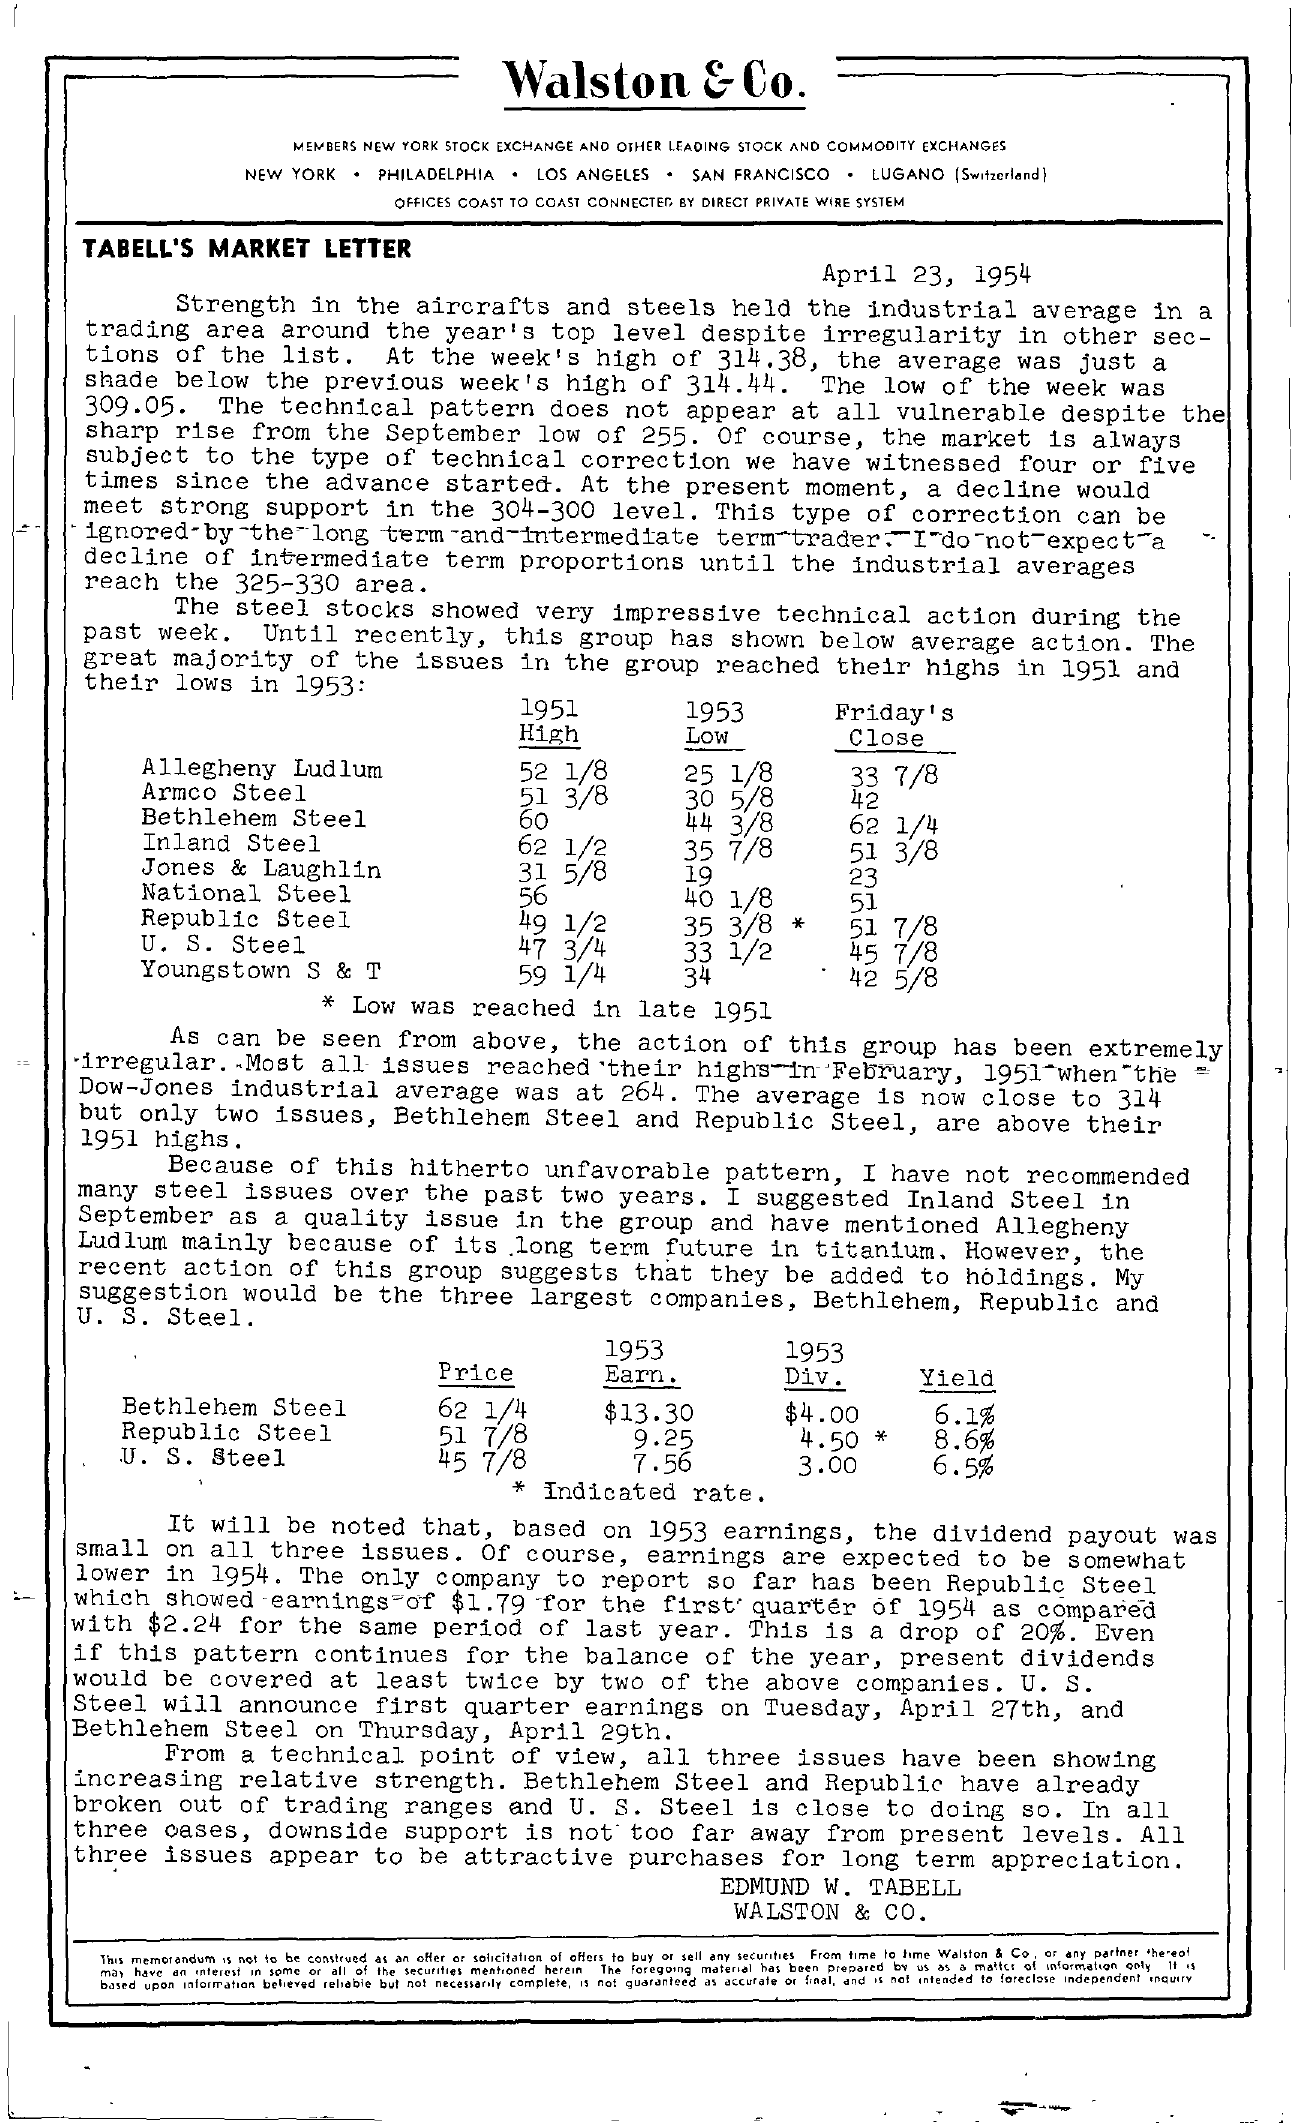 Tabell's Market Letter - April 23, 1954